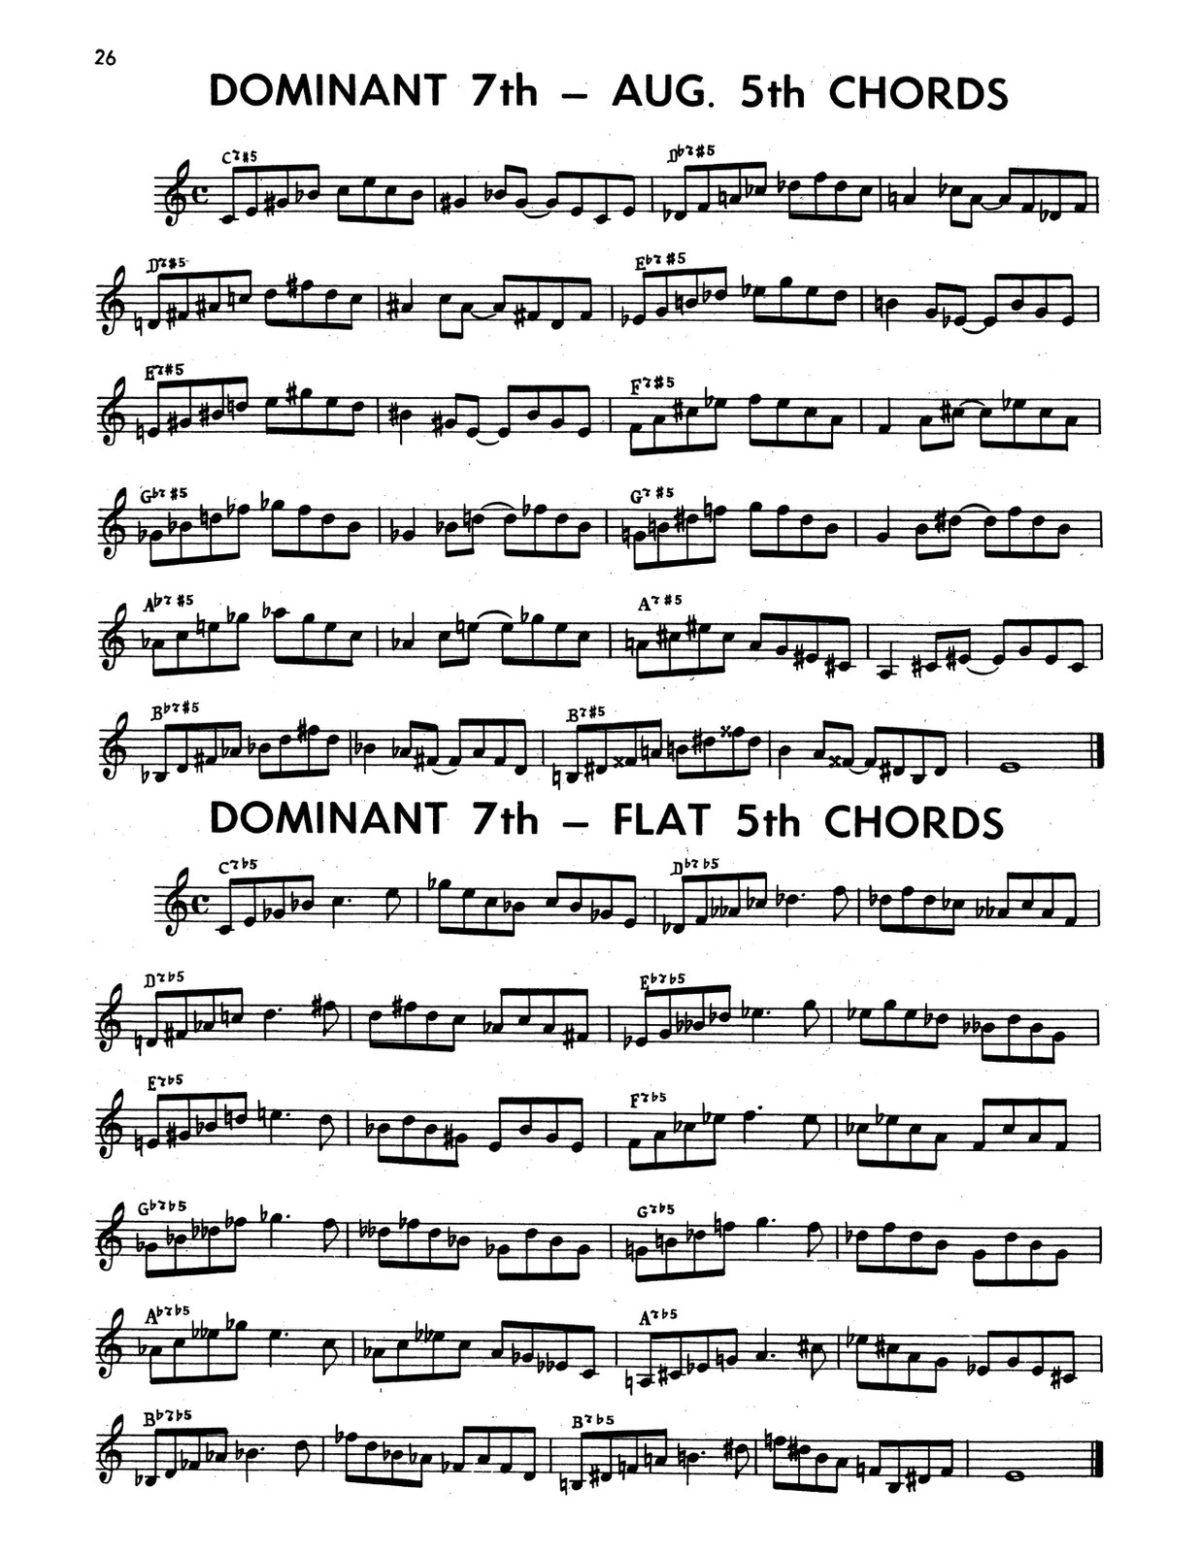 Gornston, All Chords for Trumpet-p28